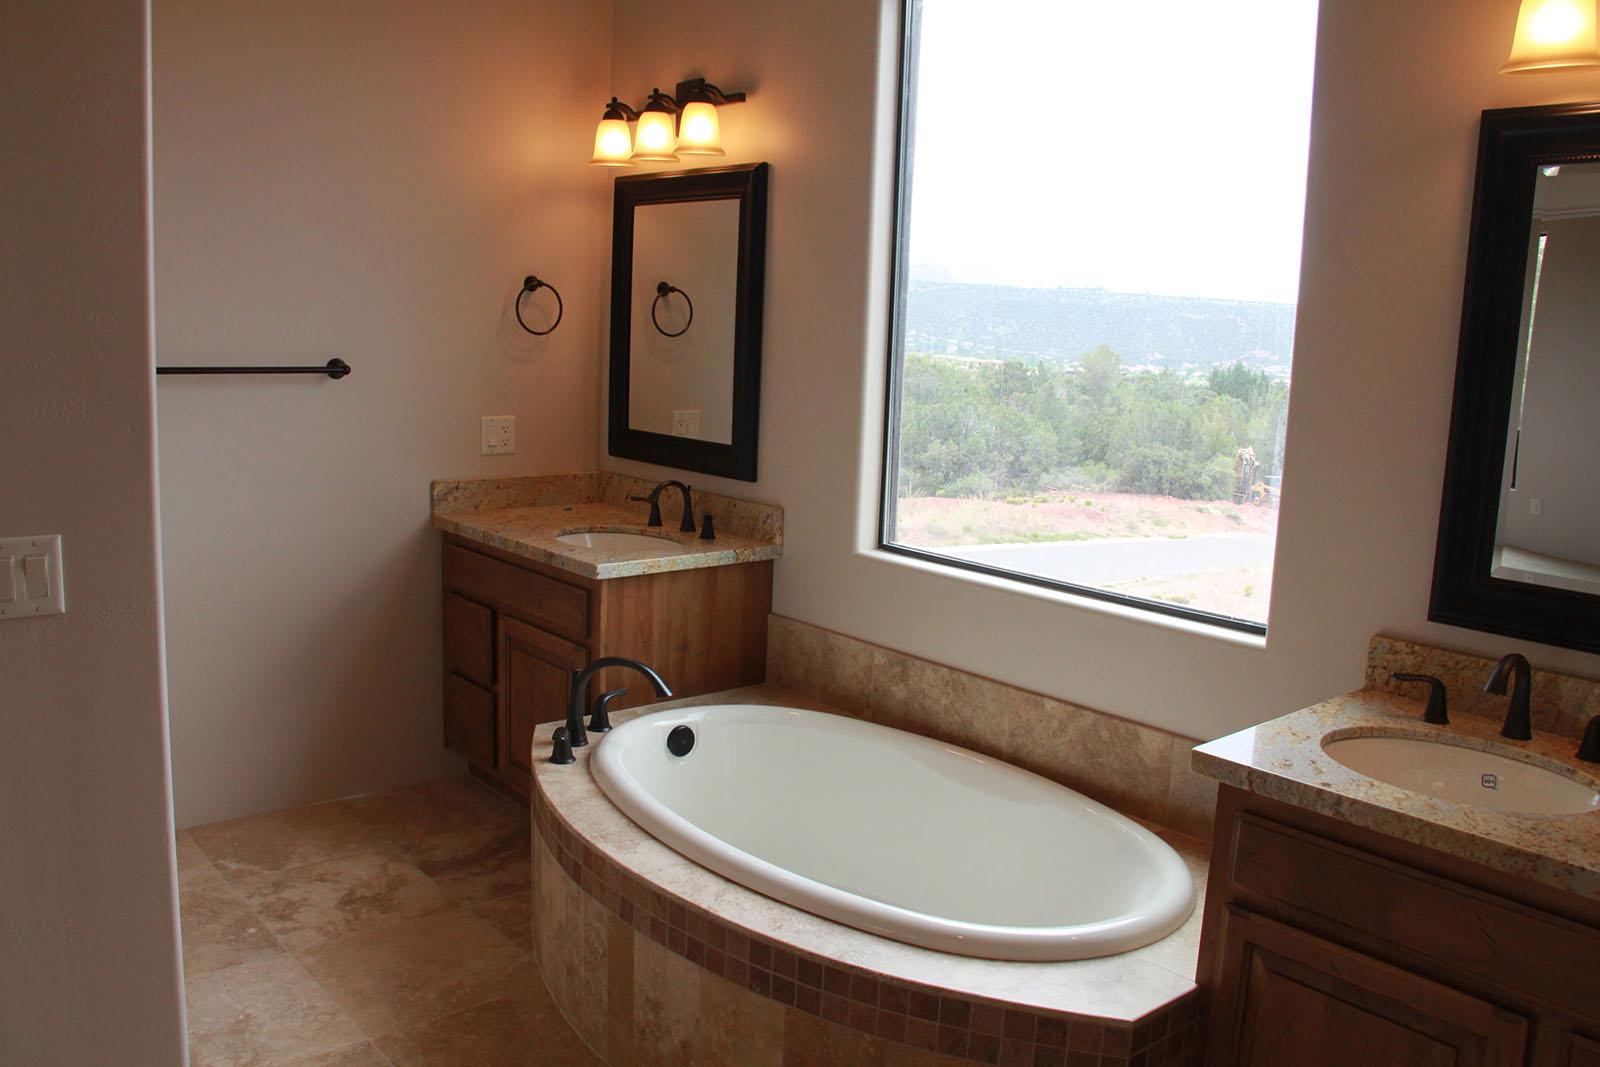 530-windsong-torel-custom-homes-sedona-arizona-0161-jpg